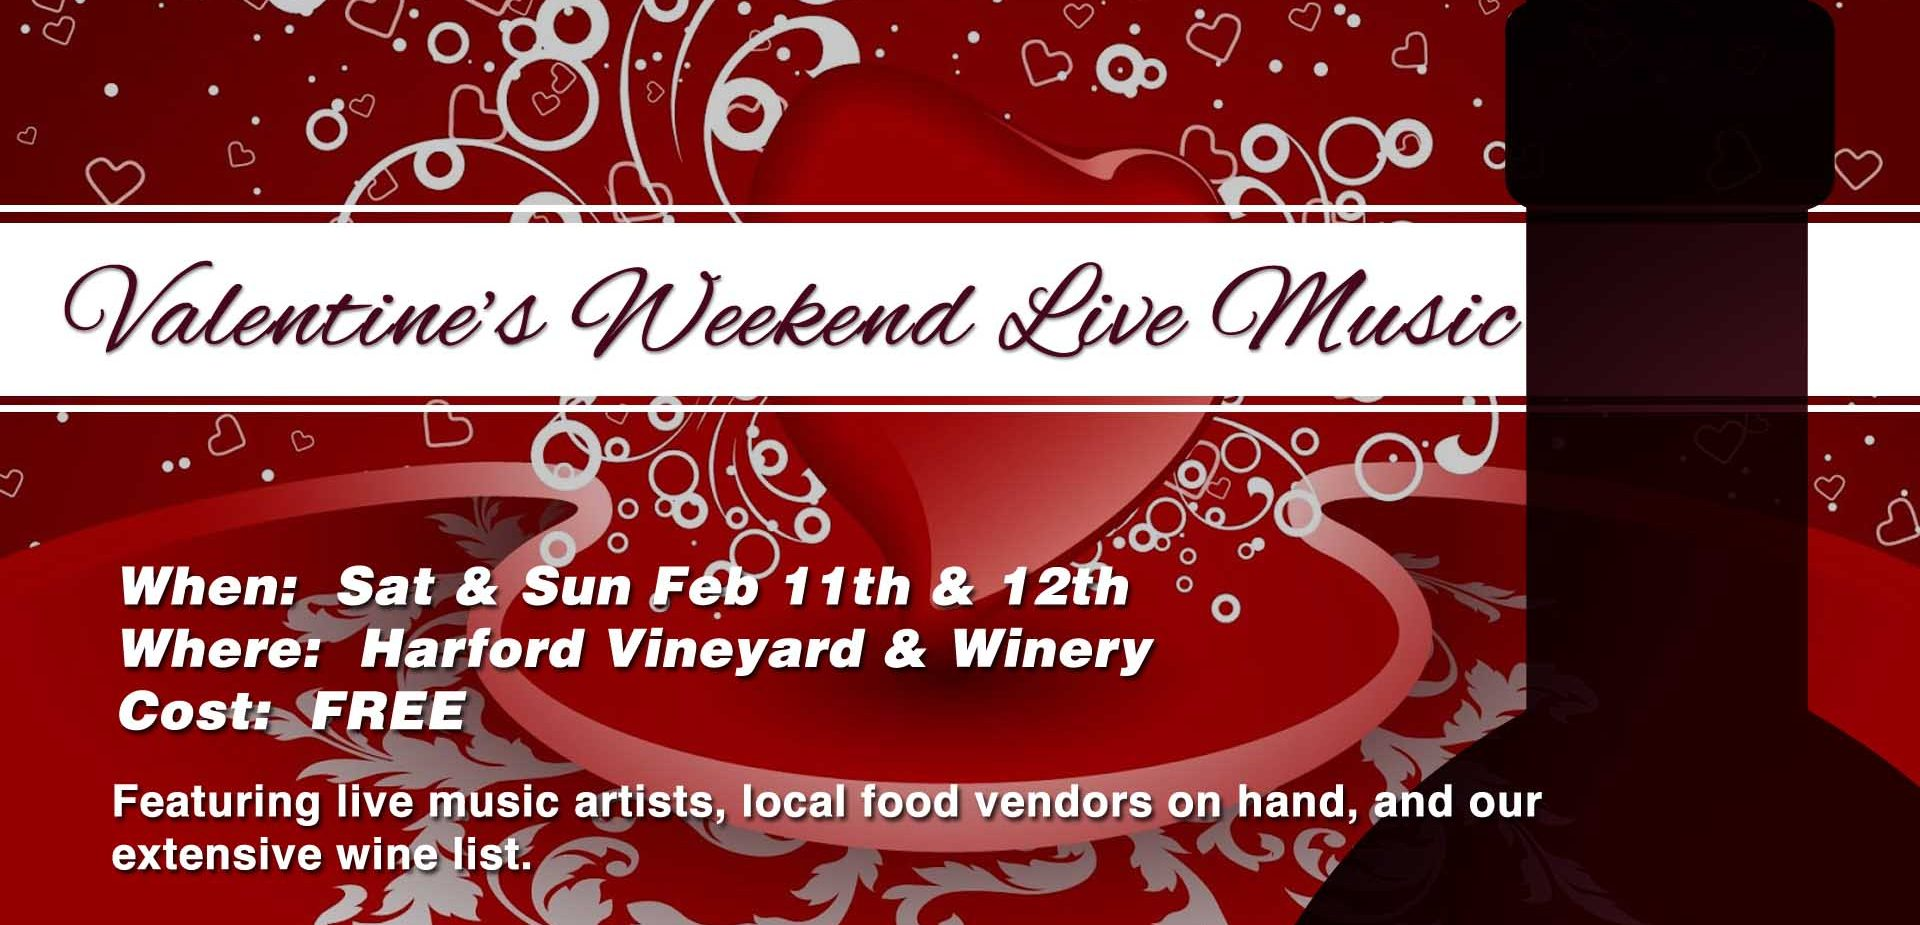 Valentines Day Weekend Music at Harford Vineyard